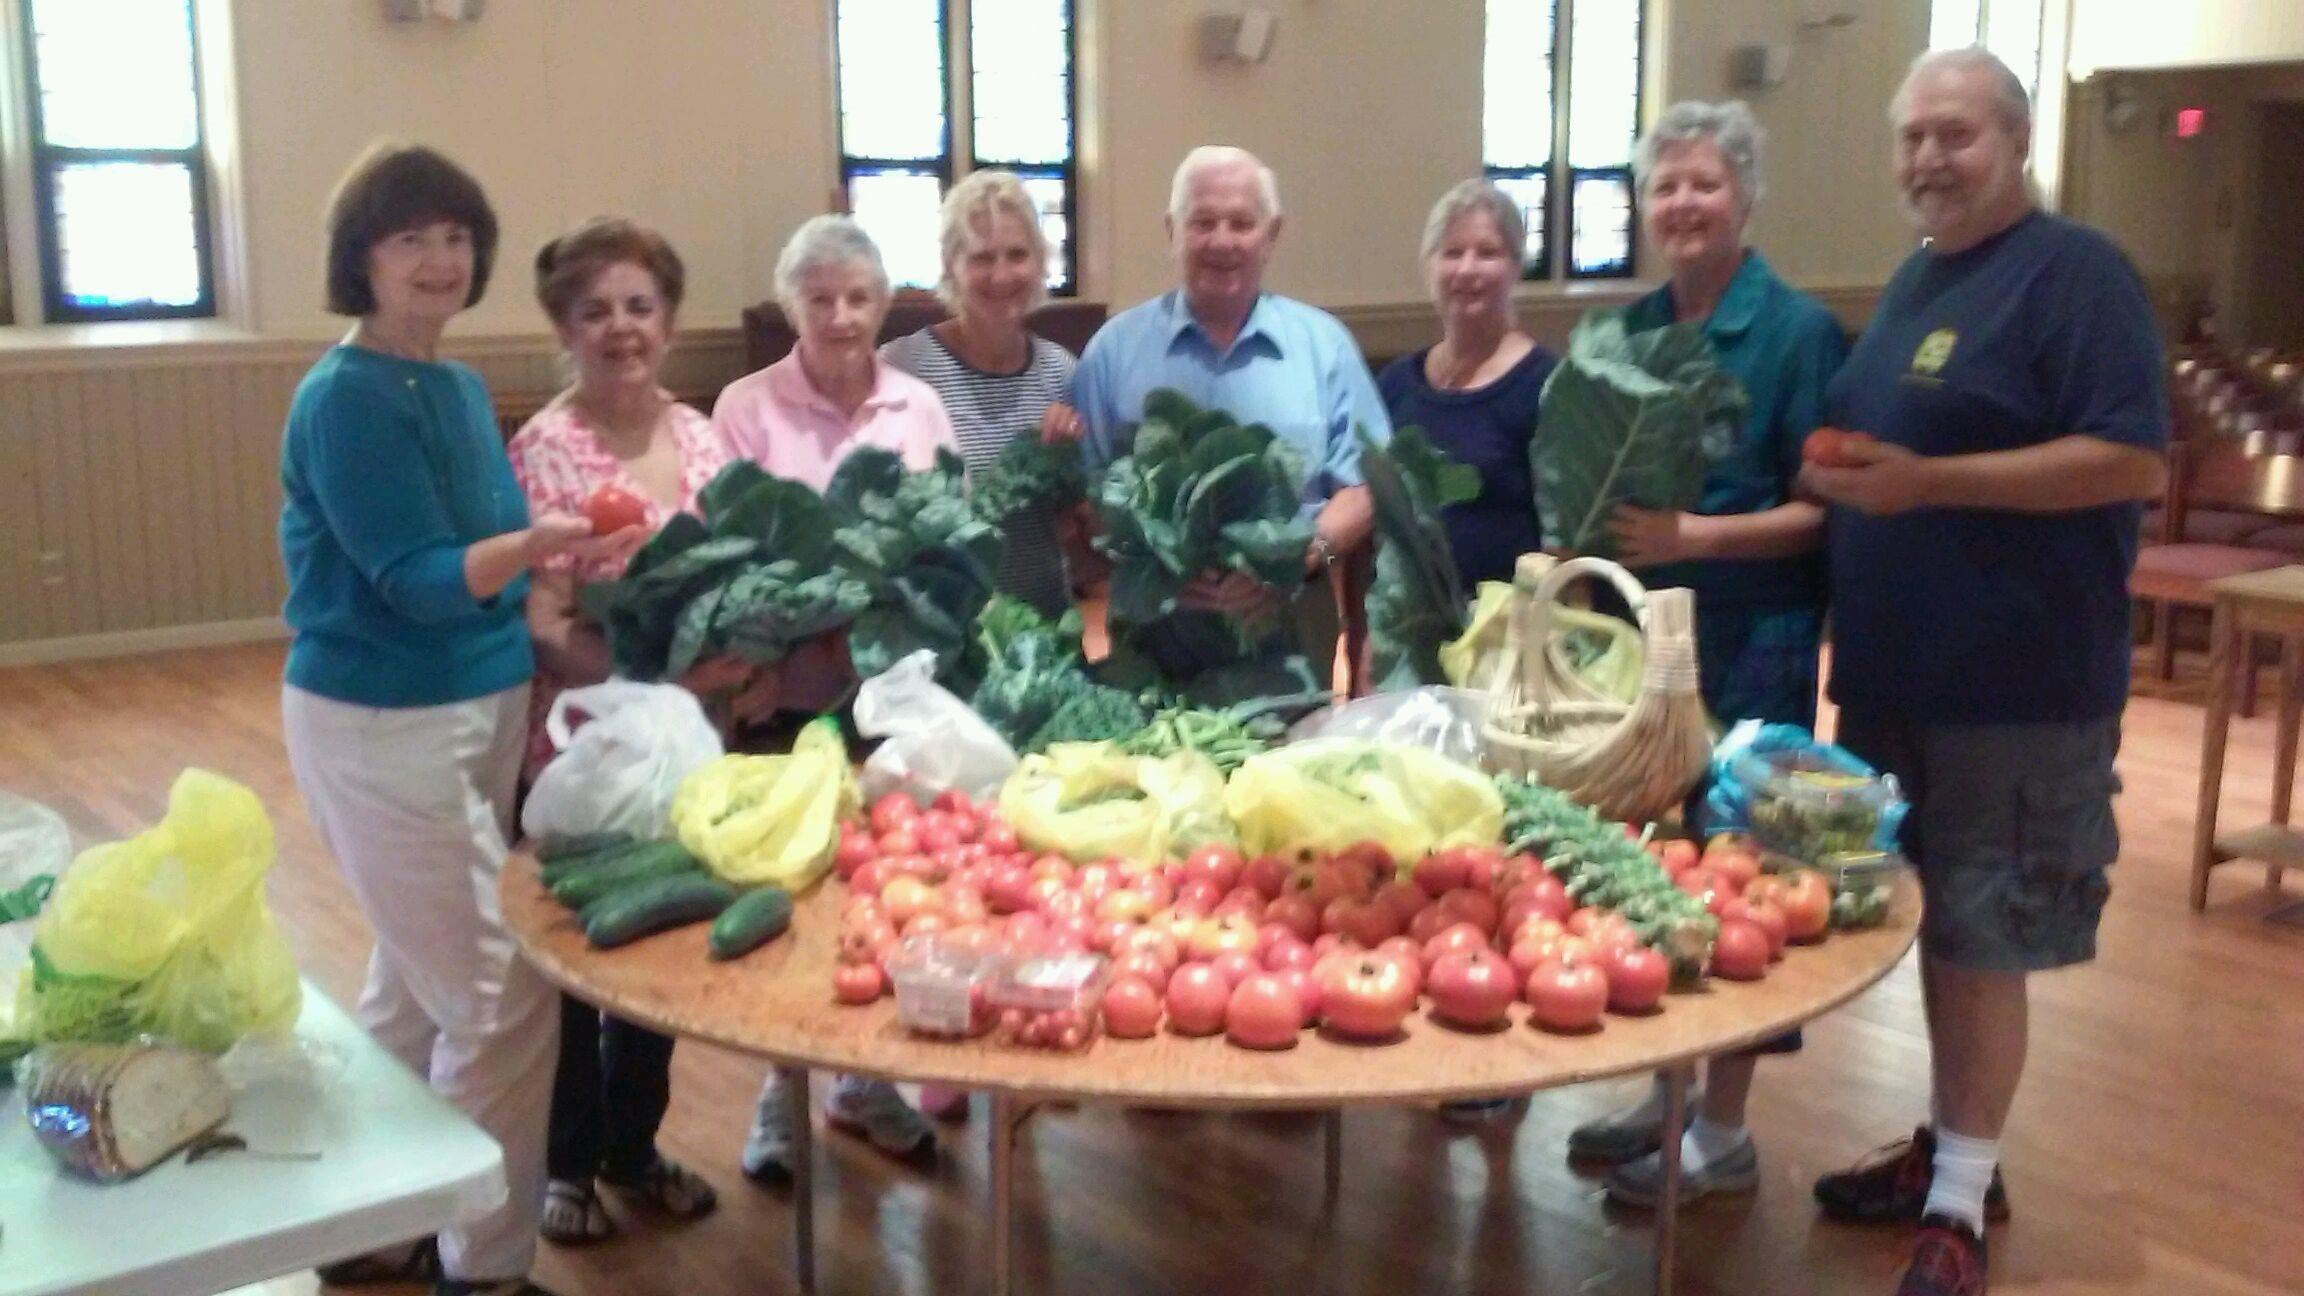 beff5fb4c49b8434e59a_Summit_Community_Garden_Bounty_for_St_Teresa_s.jpg